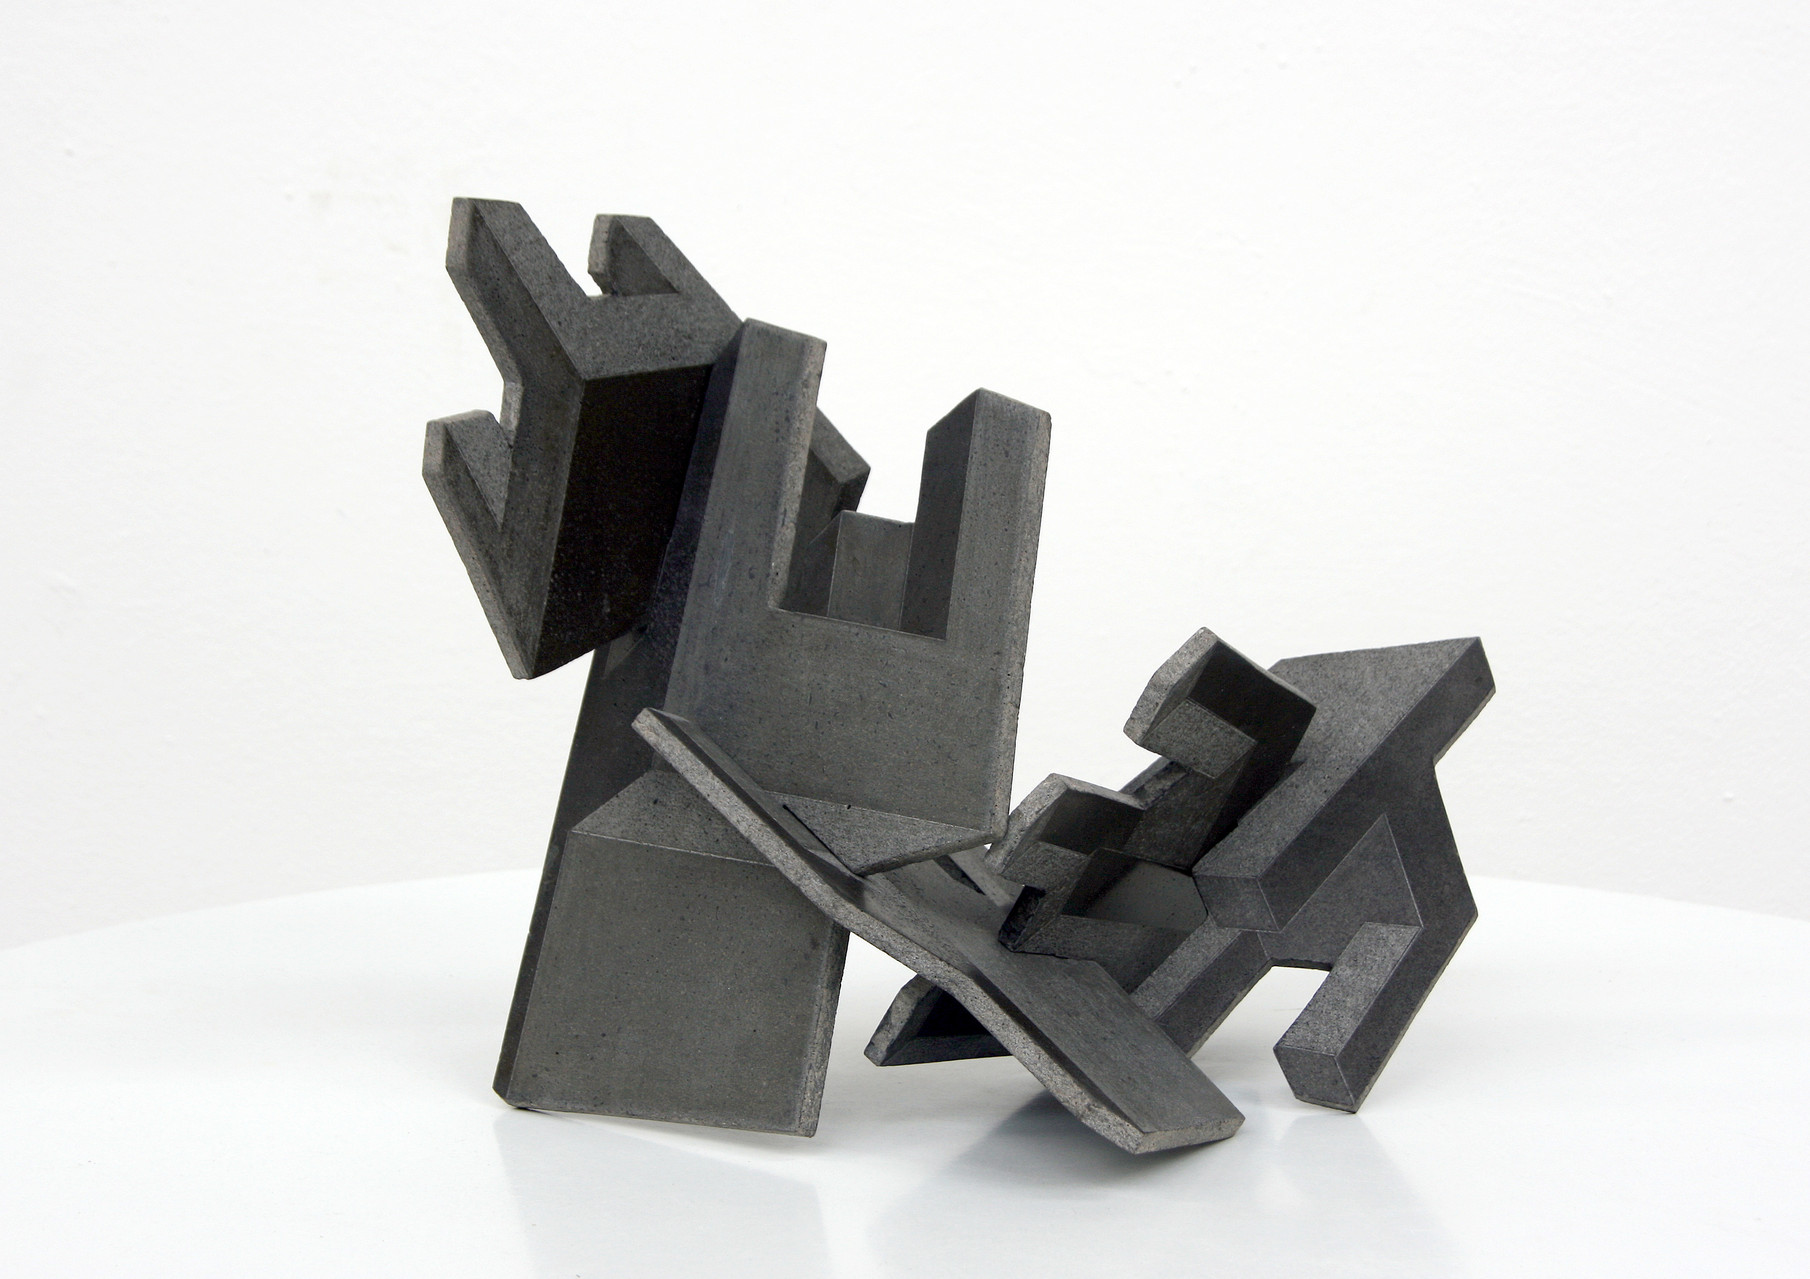 """Fünf Stühle "", Beton/Gravur, 33 x 38 x 32, 2010"